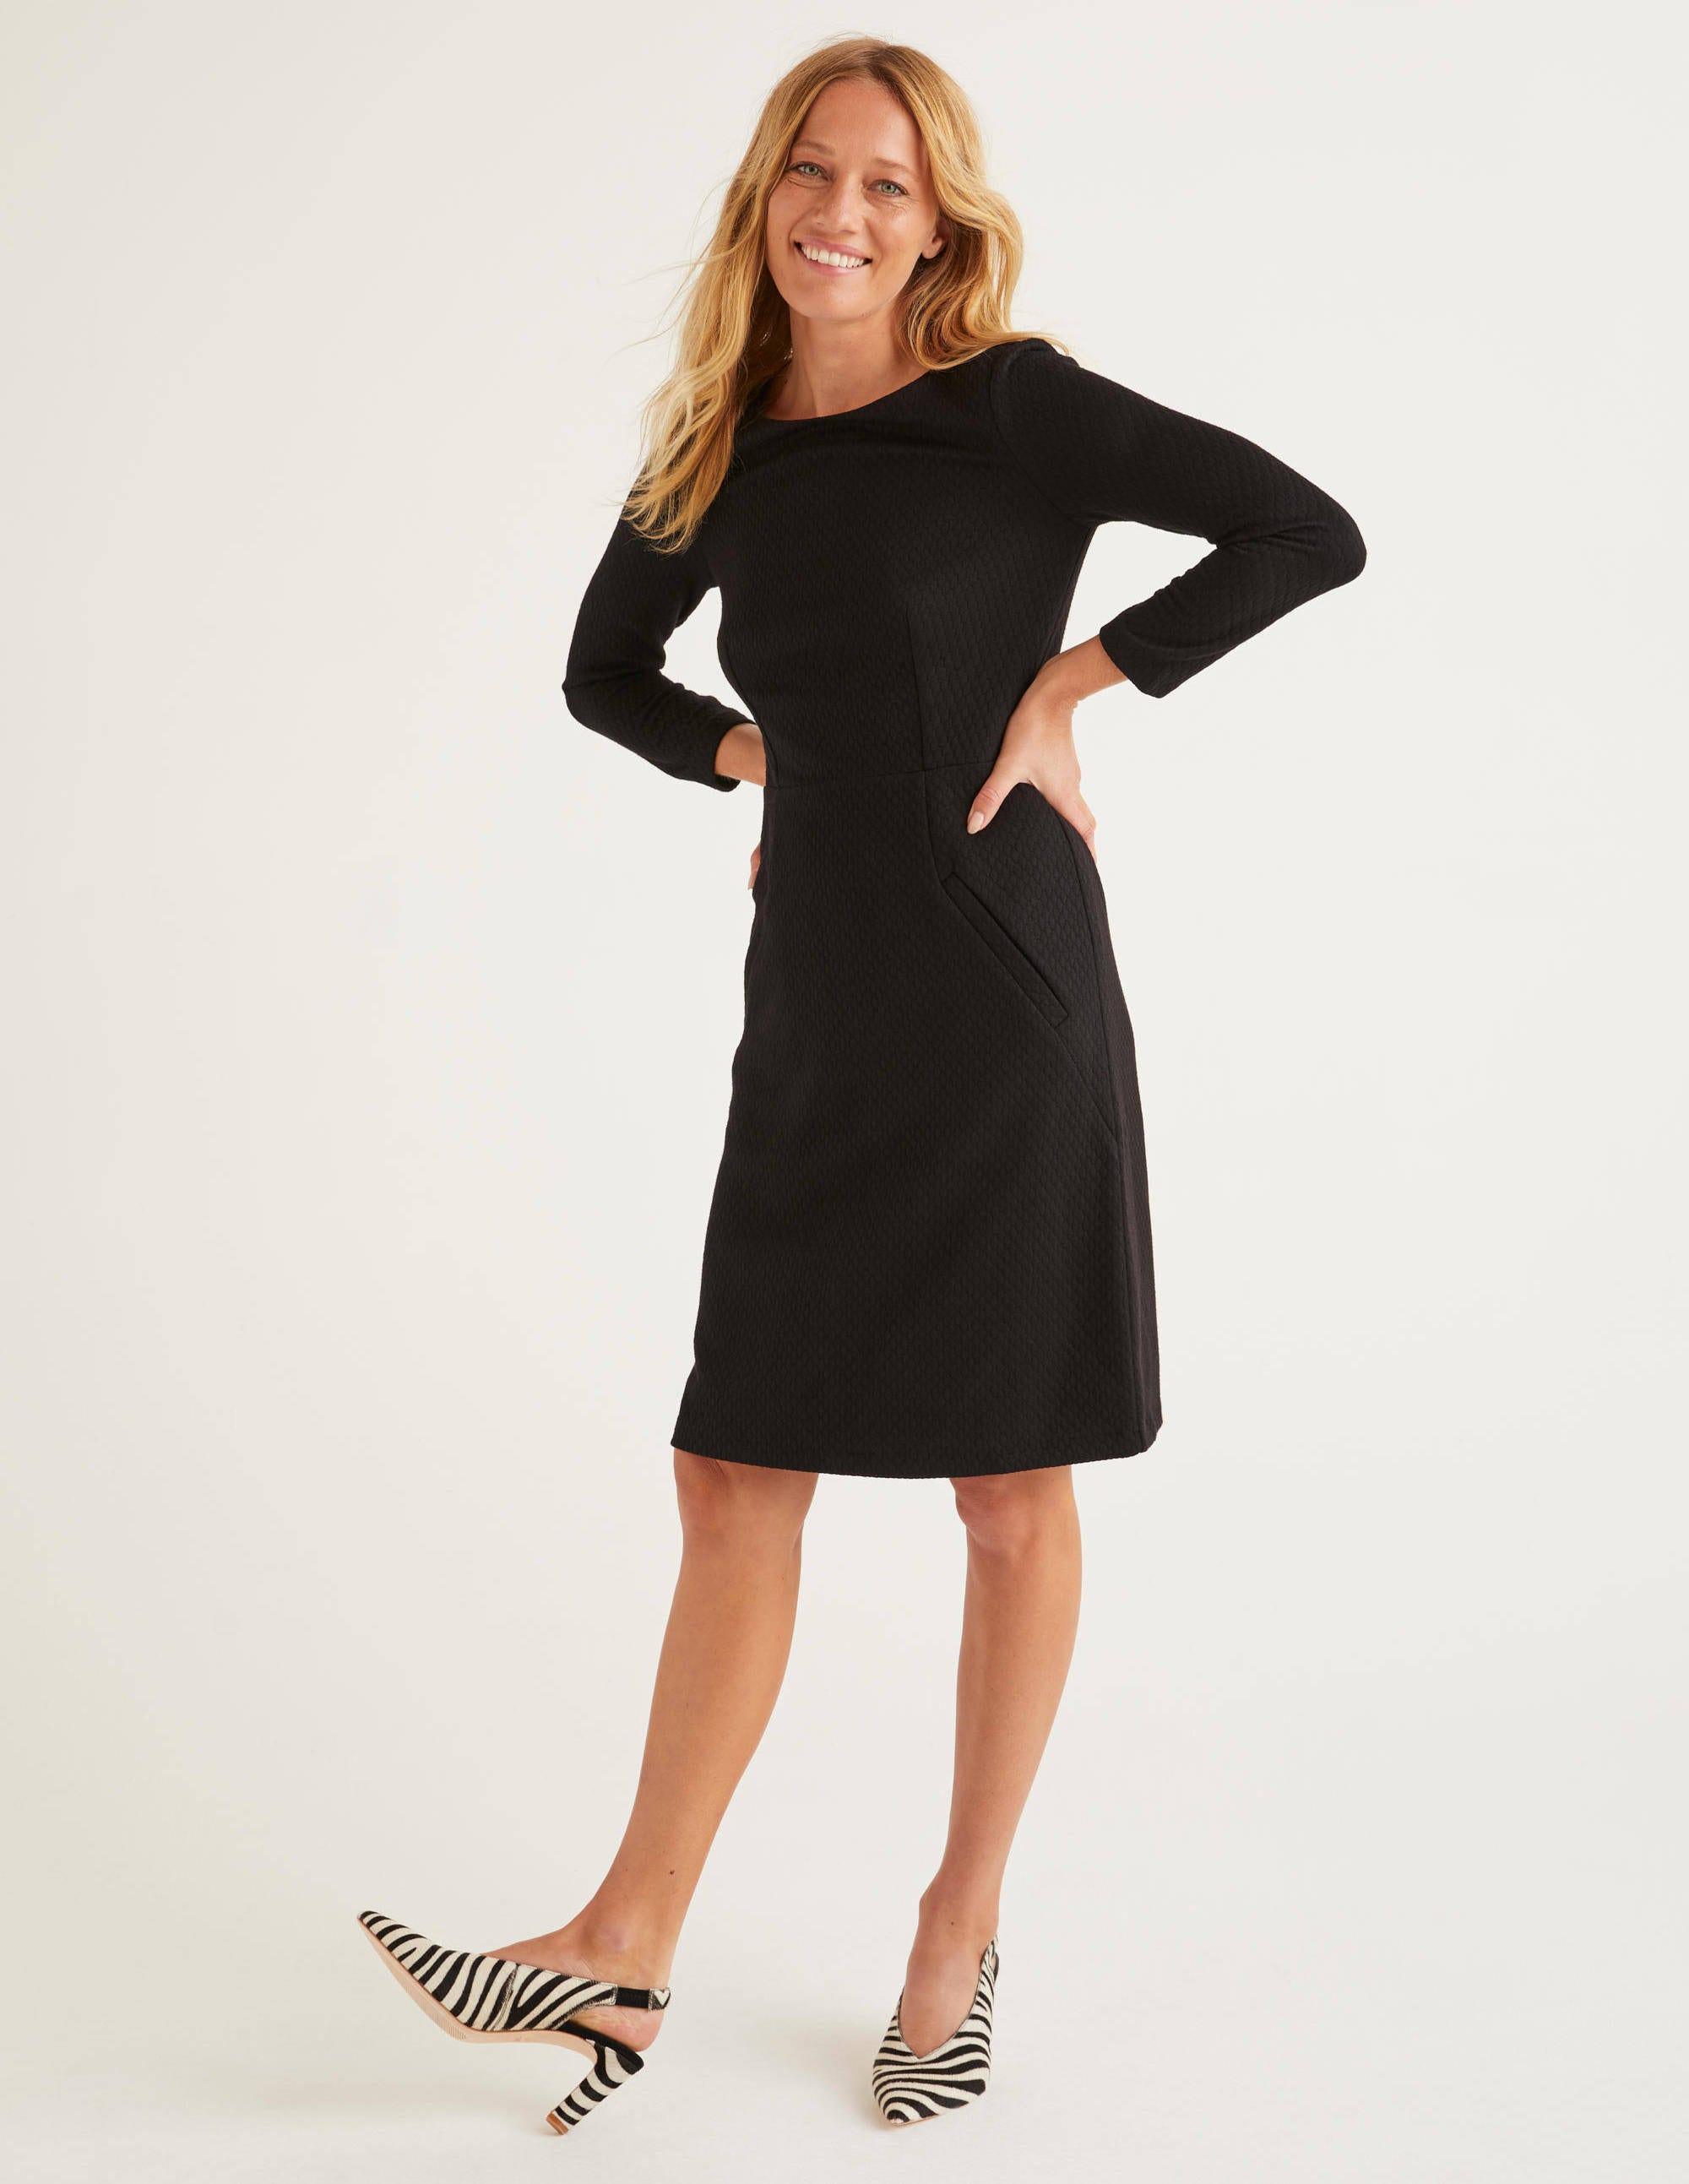 Boden Agnes Jacquard Dress - Black